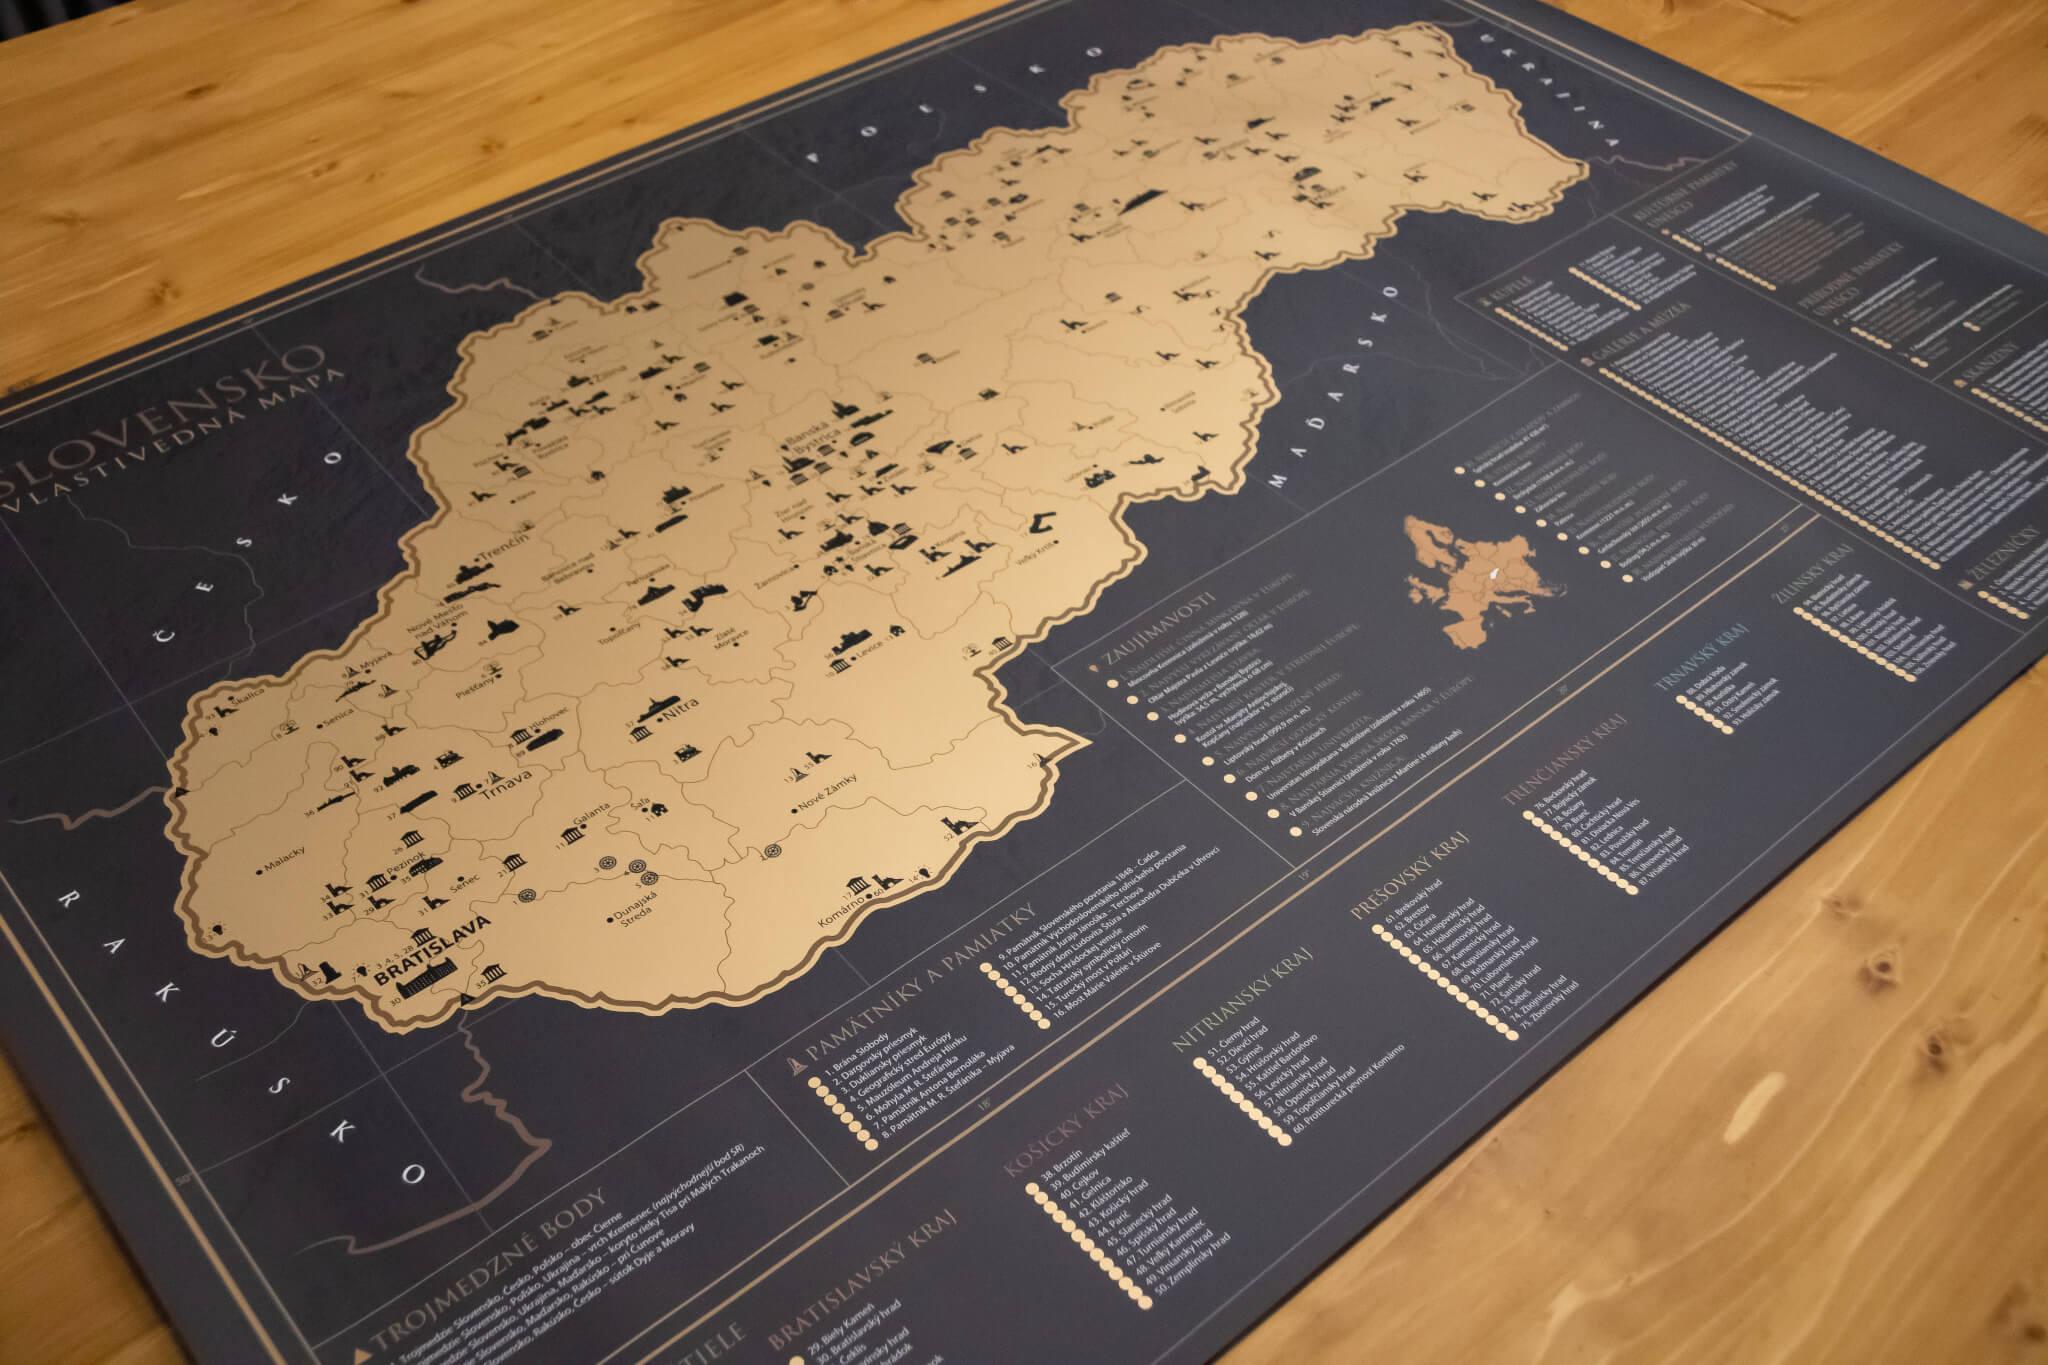 Mapa para raspar de Eslovaquia - Vista del mapa completo